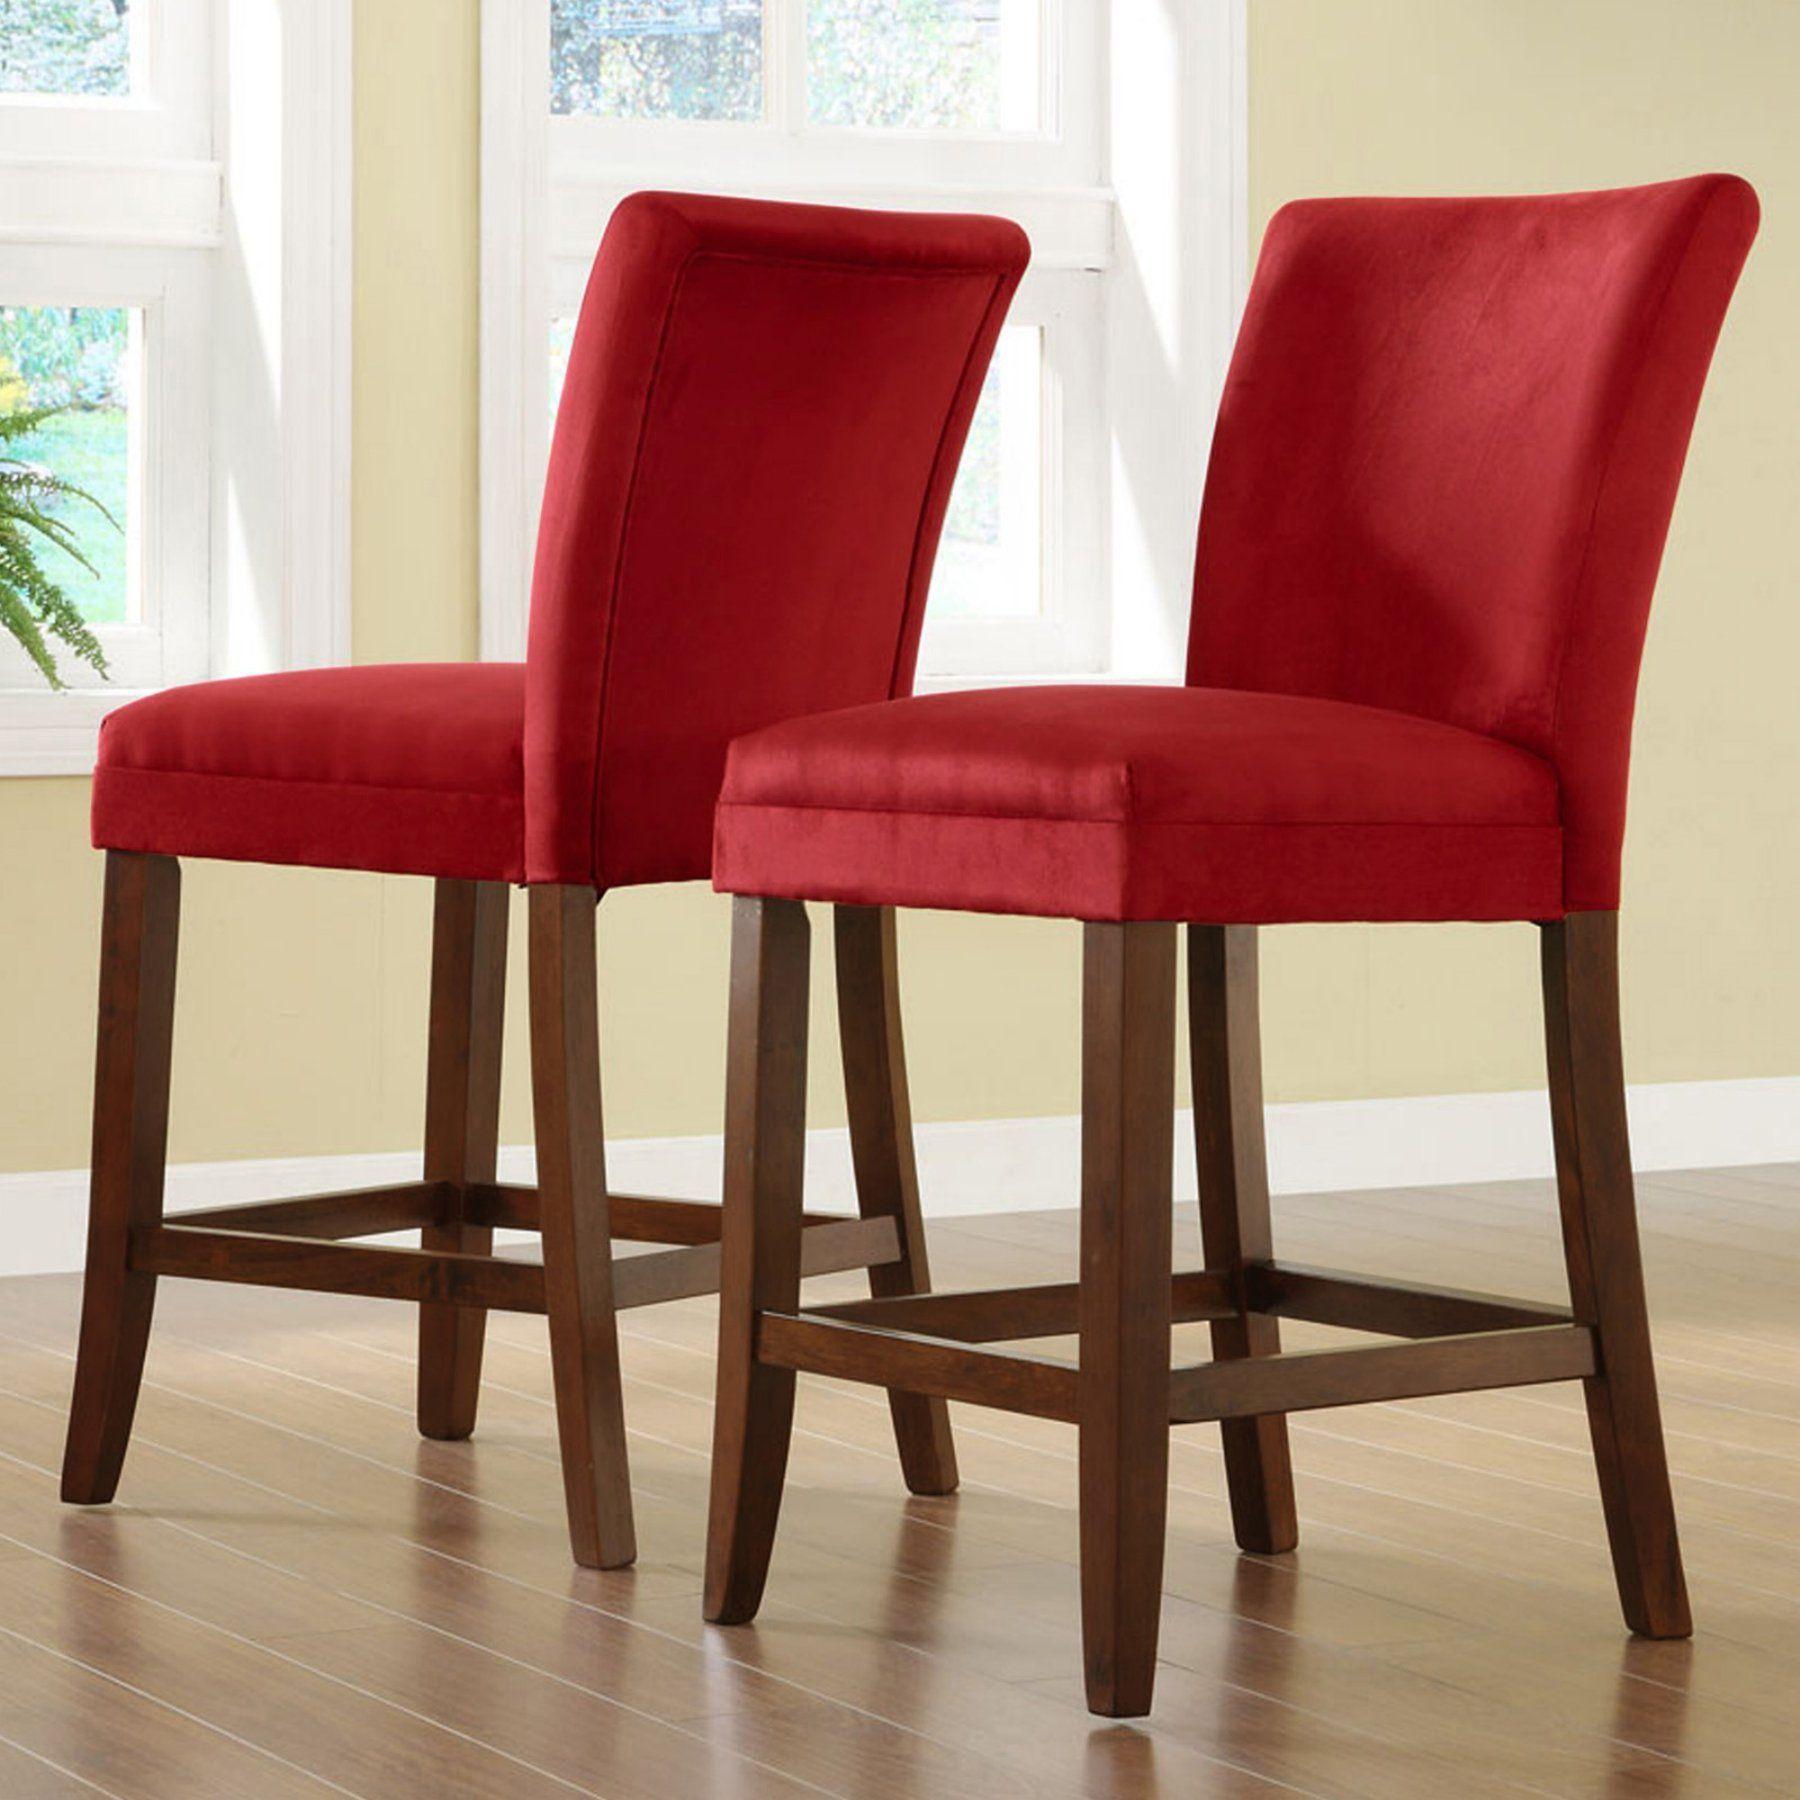 Strange Weston Home Achillea Pub Chair Red Fabric Set Of 2 721Rd Uwap Interior Chair Design Uwaporg